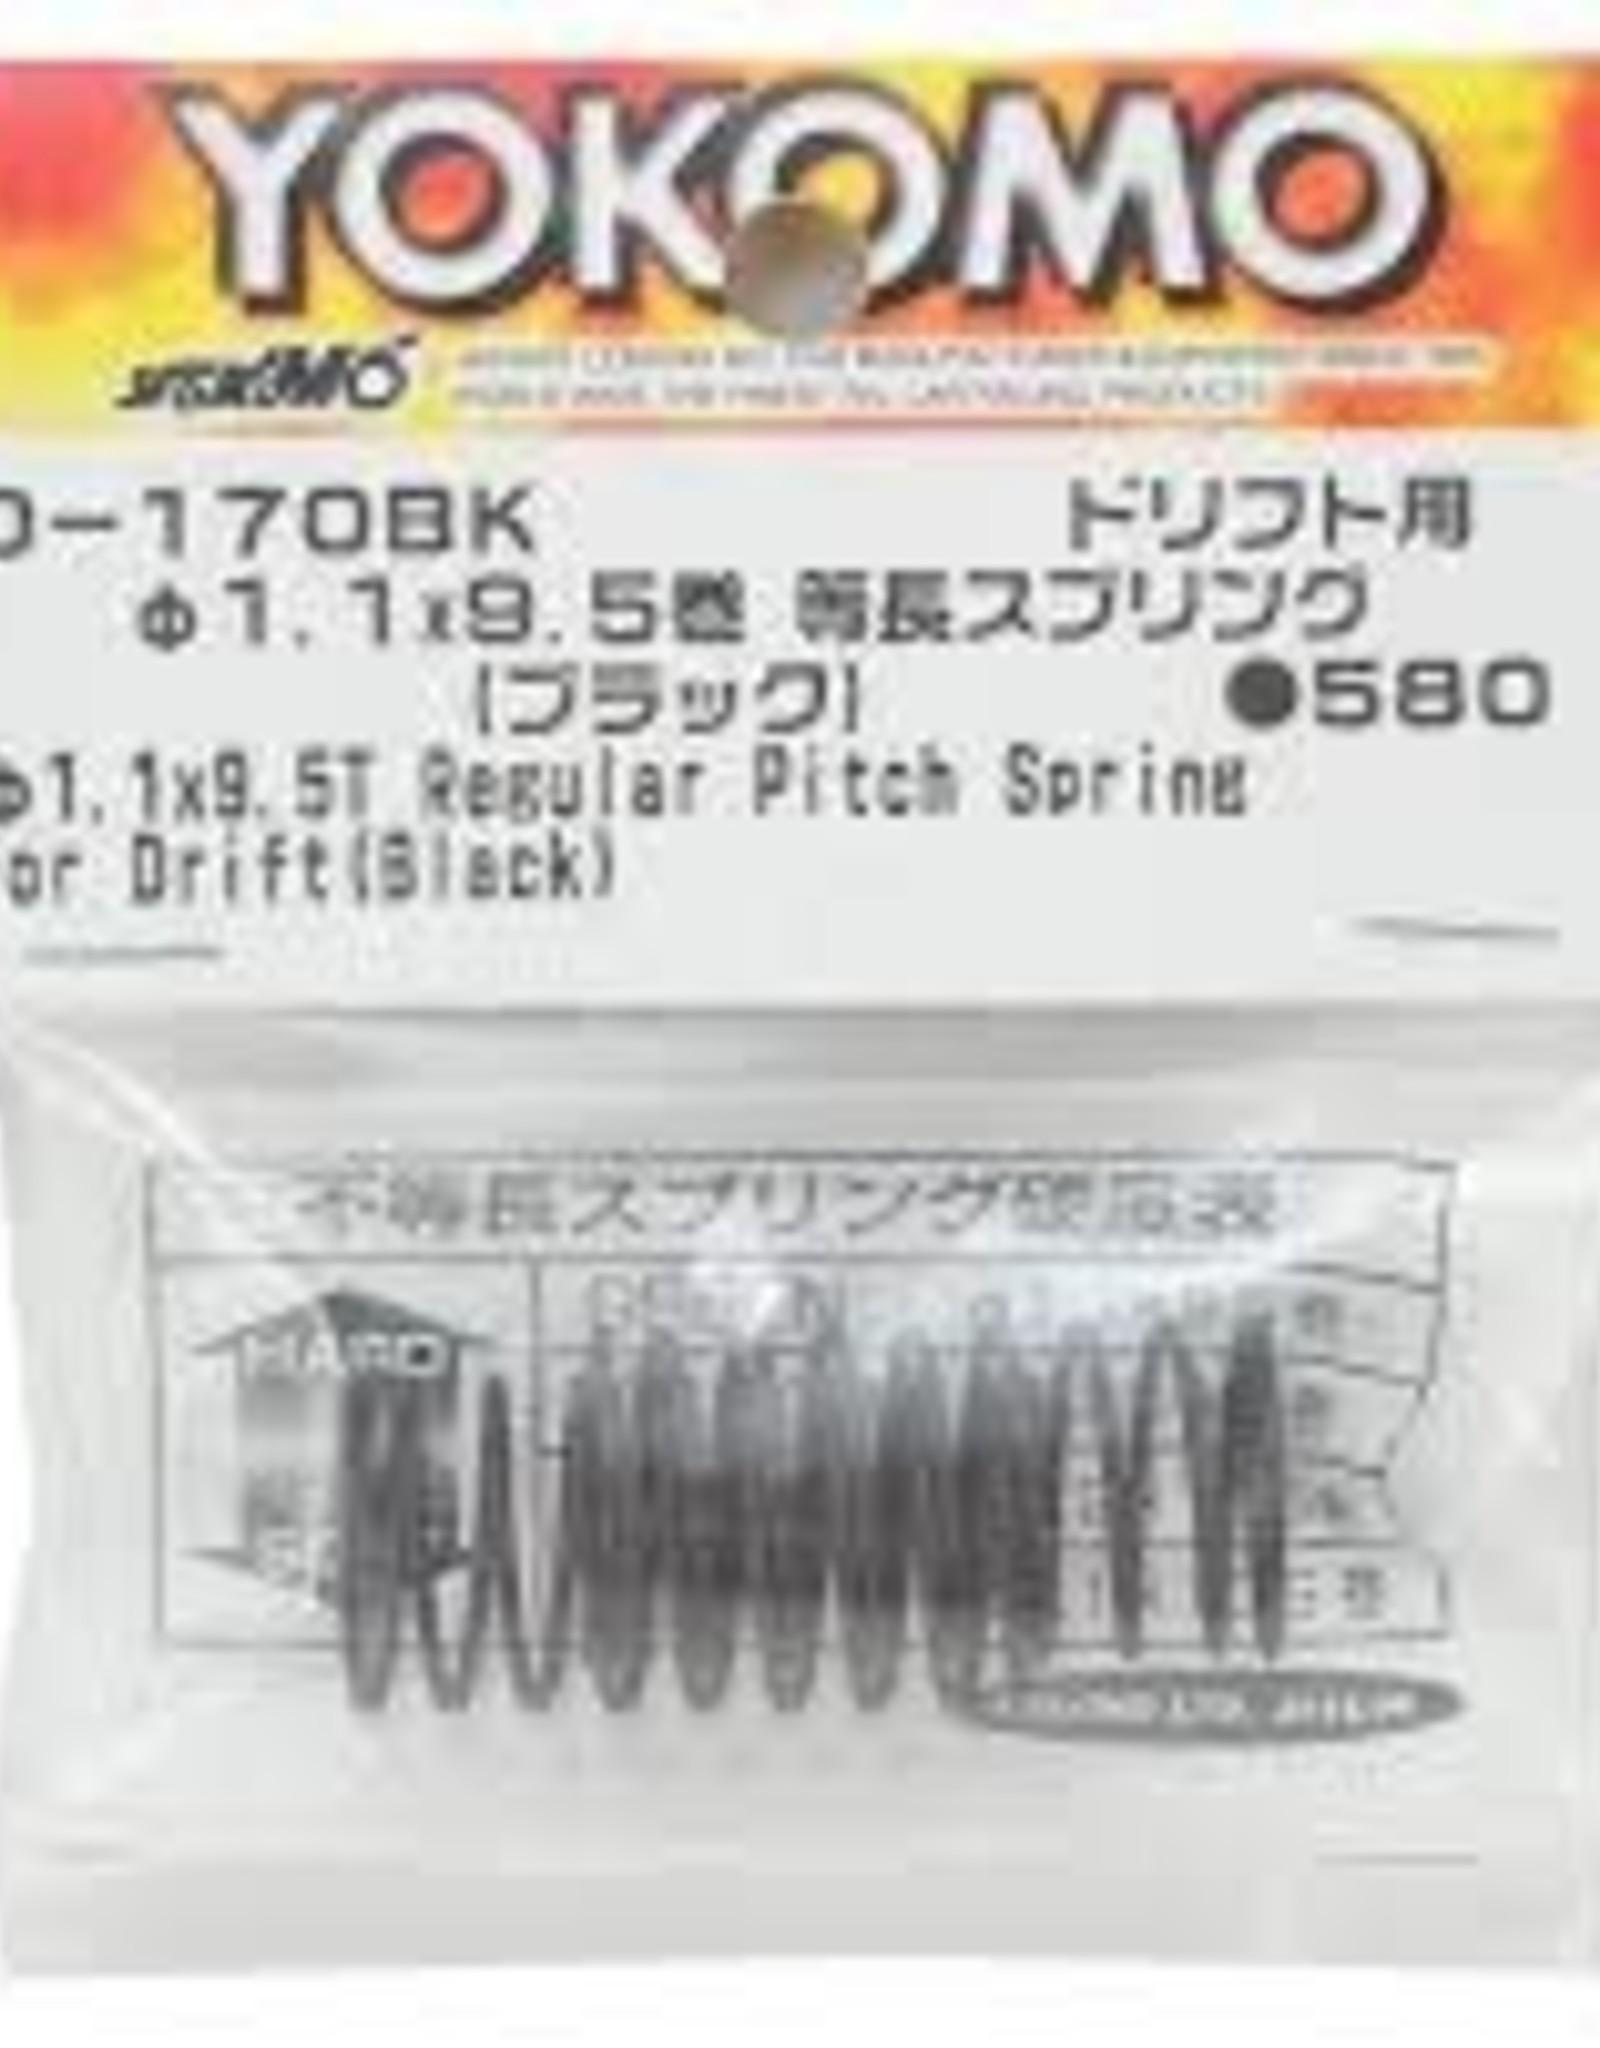 Yokomo YOKD-170BK 32mm Regular Pitch Drift Spring 1.1 x 9.5 coils Black D-170BK Yokomo